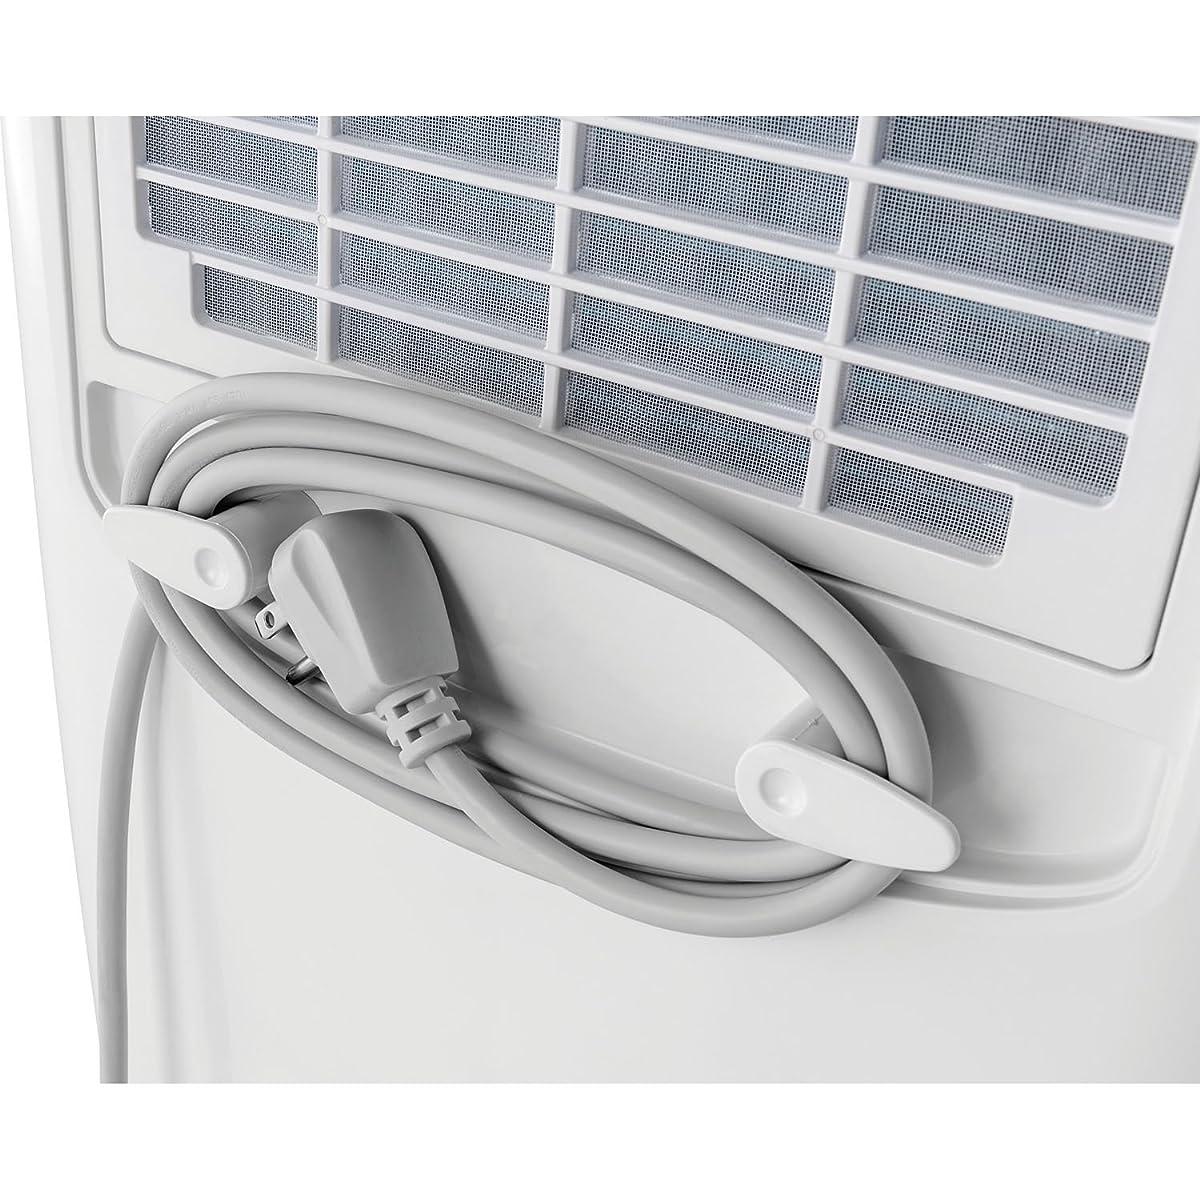 Frigidaire FFAD7033R1 70-Pint Dehumidifier with Effortless Humidity Control, White